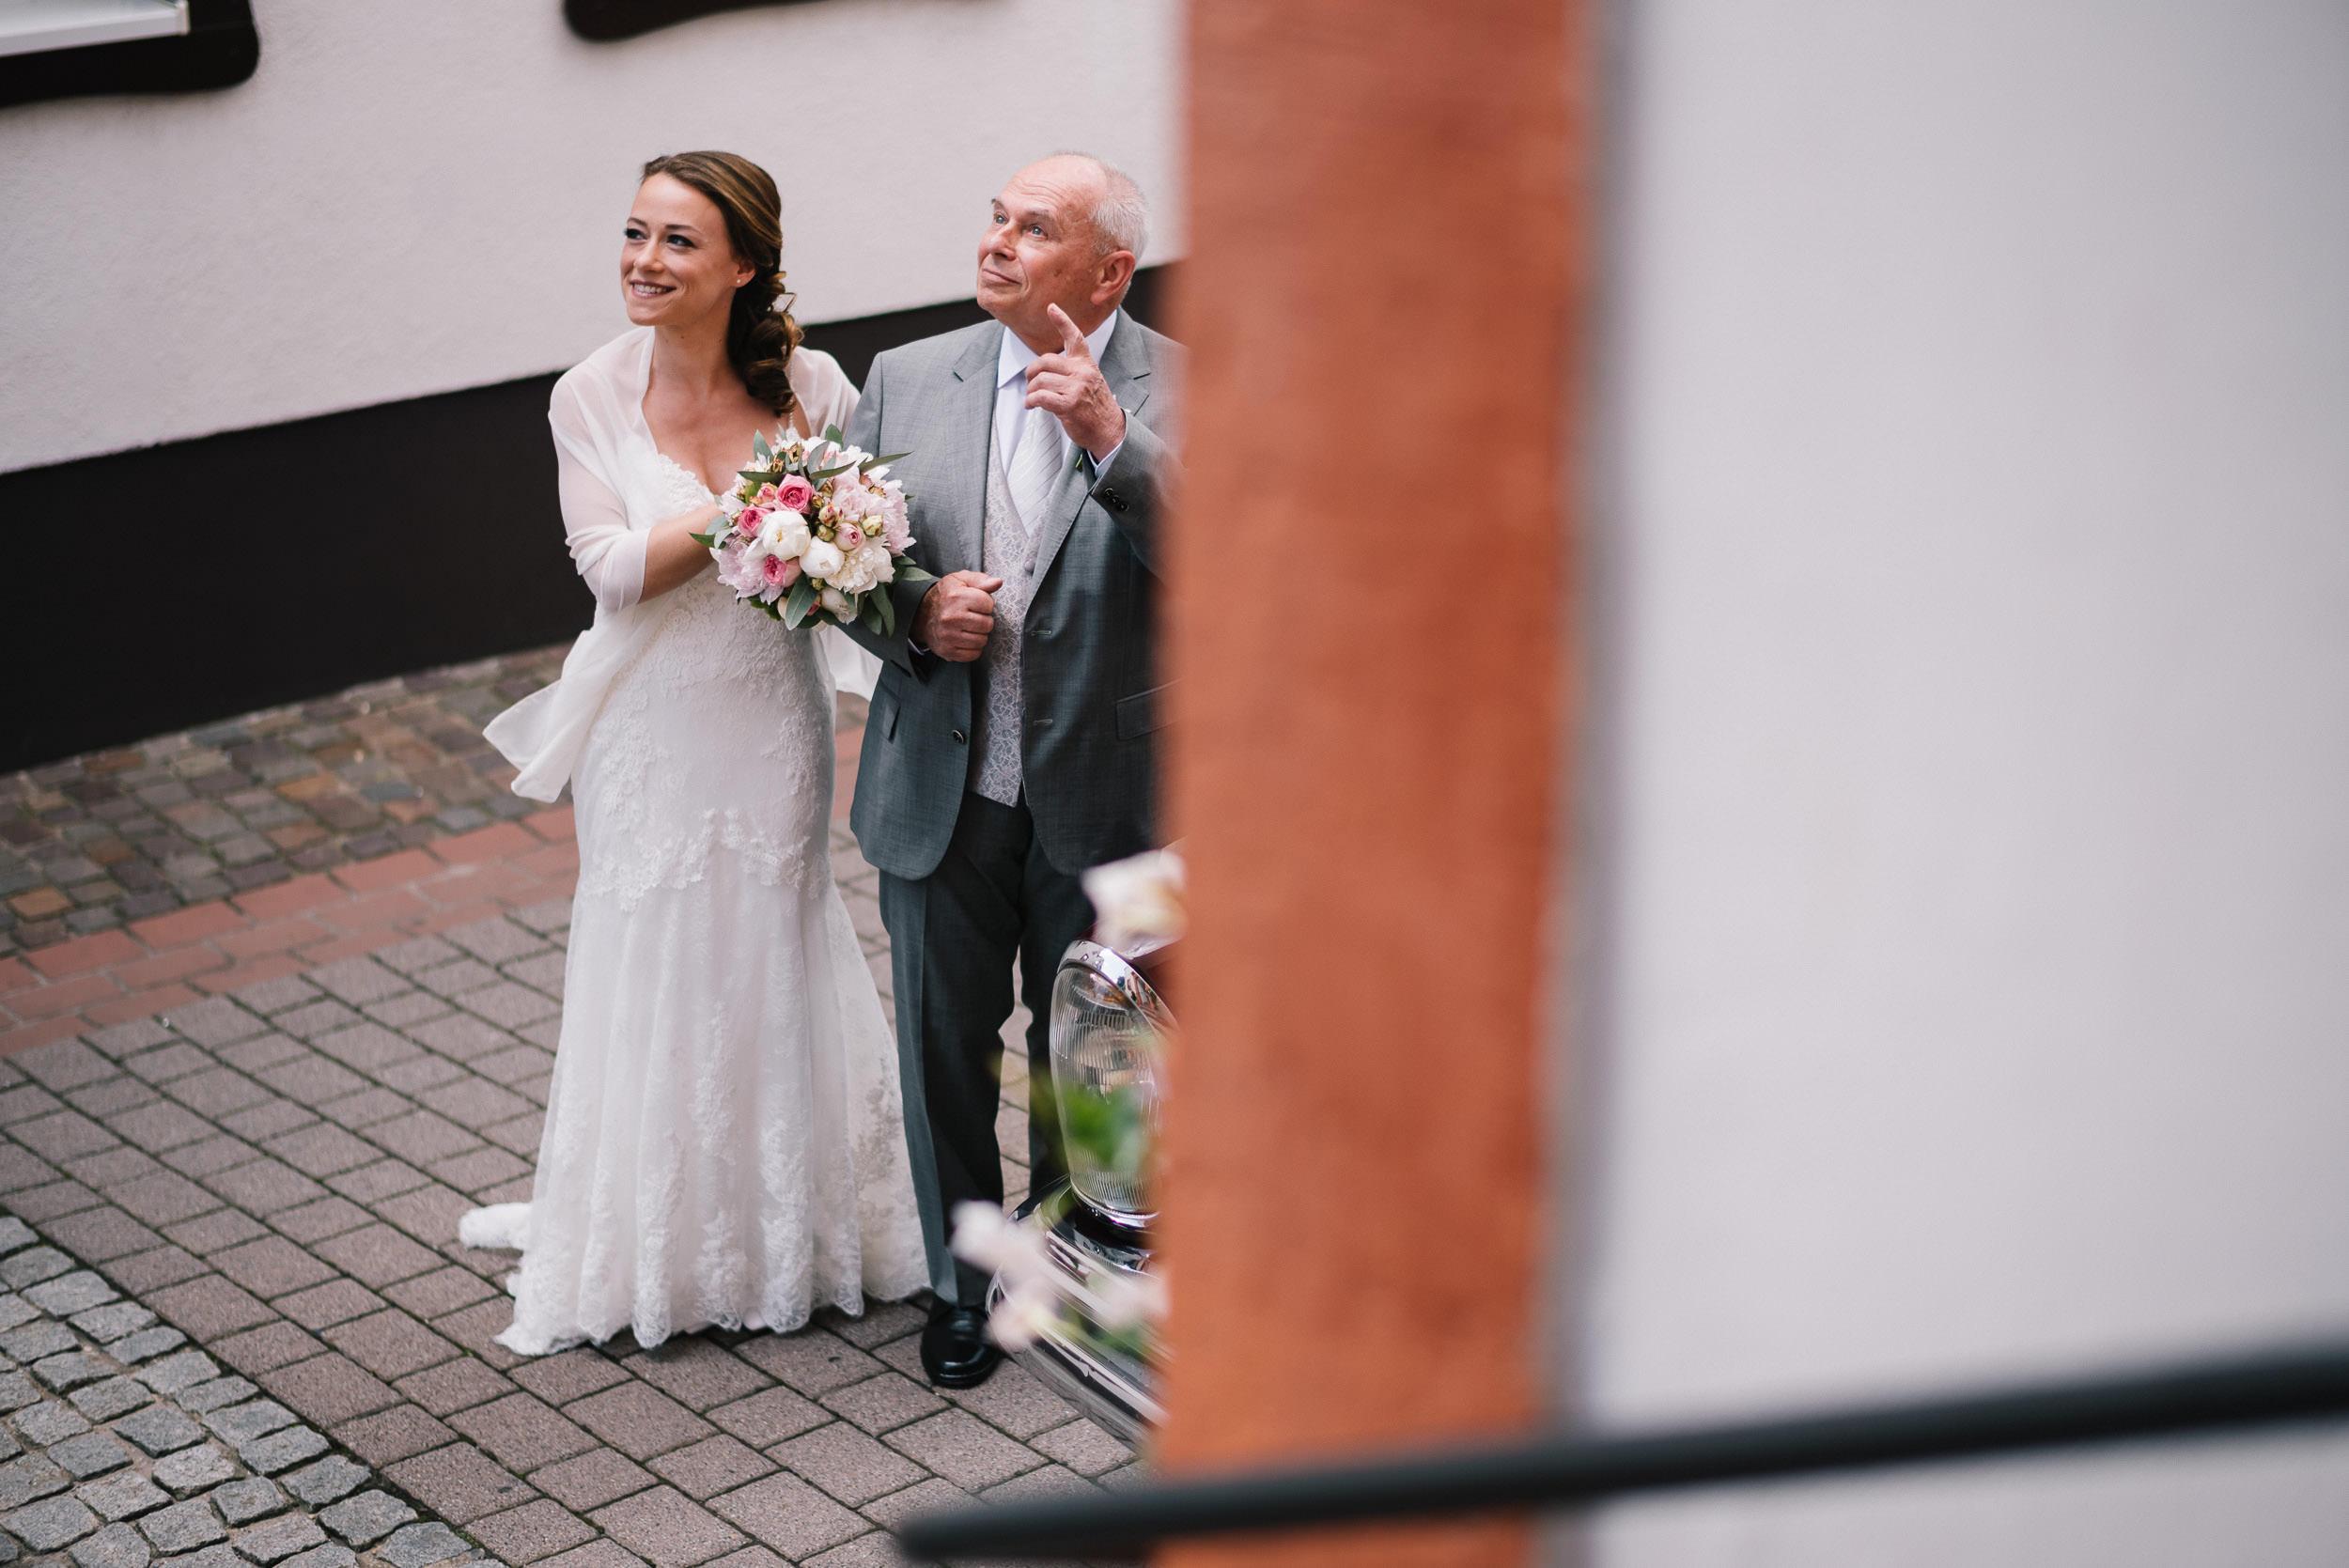 Hochzeit-Julia+Lars-Leimen+Bonsaizentrum-HD-021.jpg